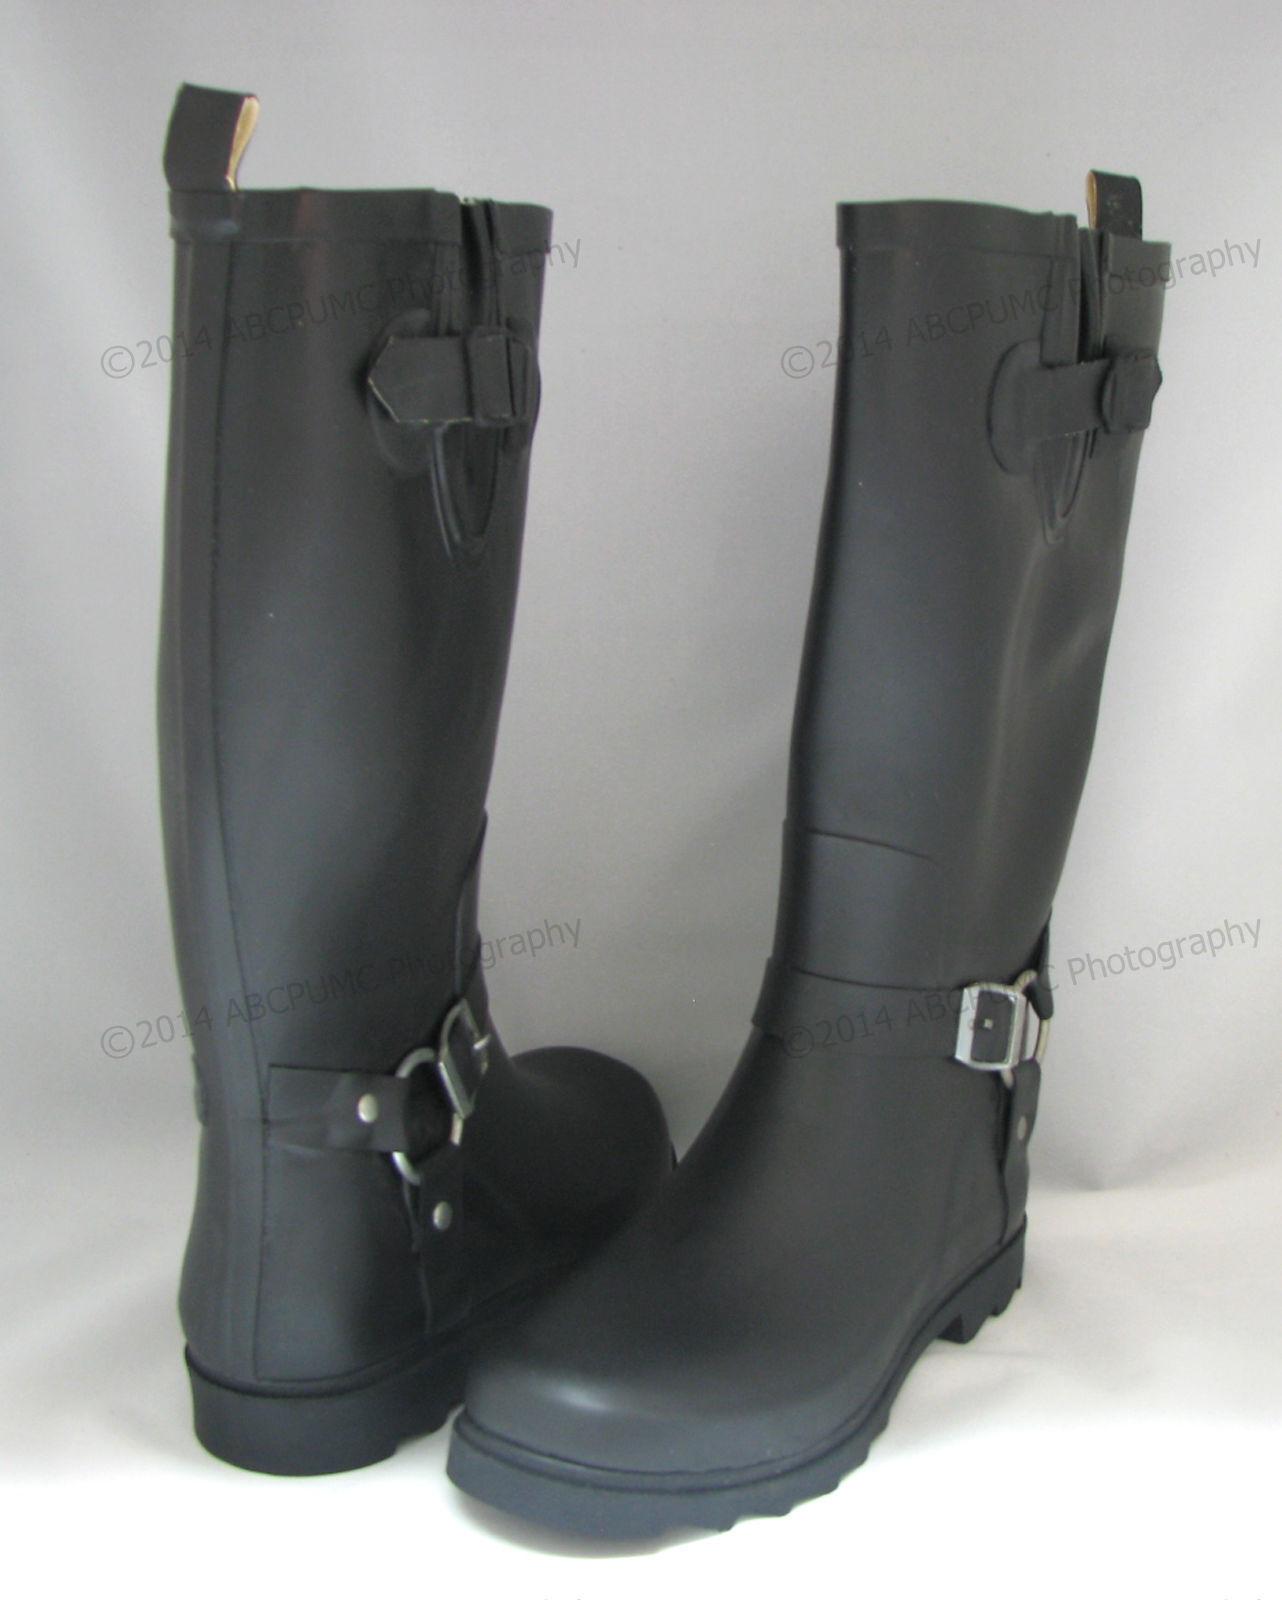 New Women's Rain Boots Harness Motocycle Mid-Calf Wellies Sn